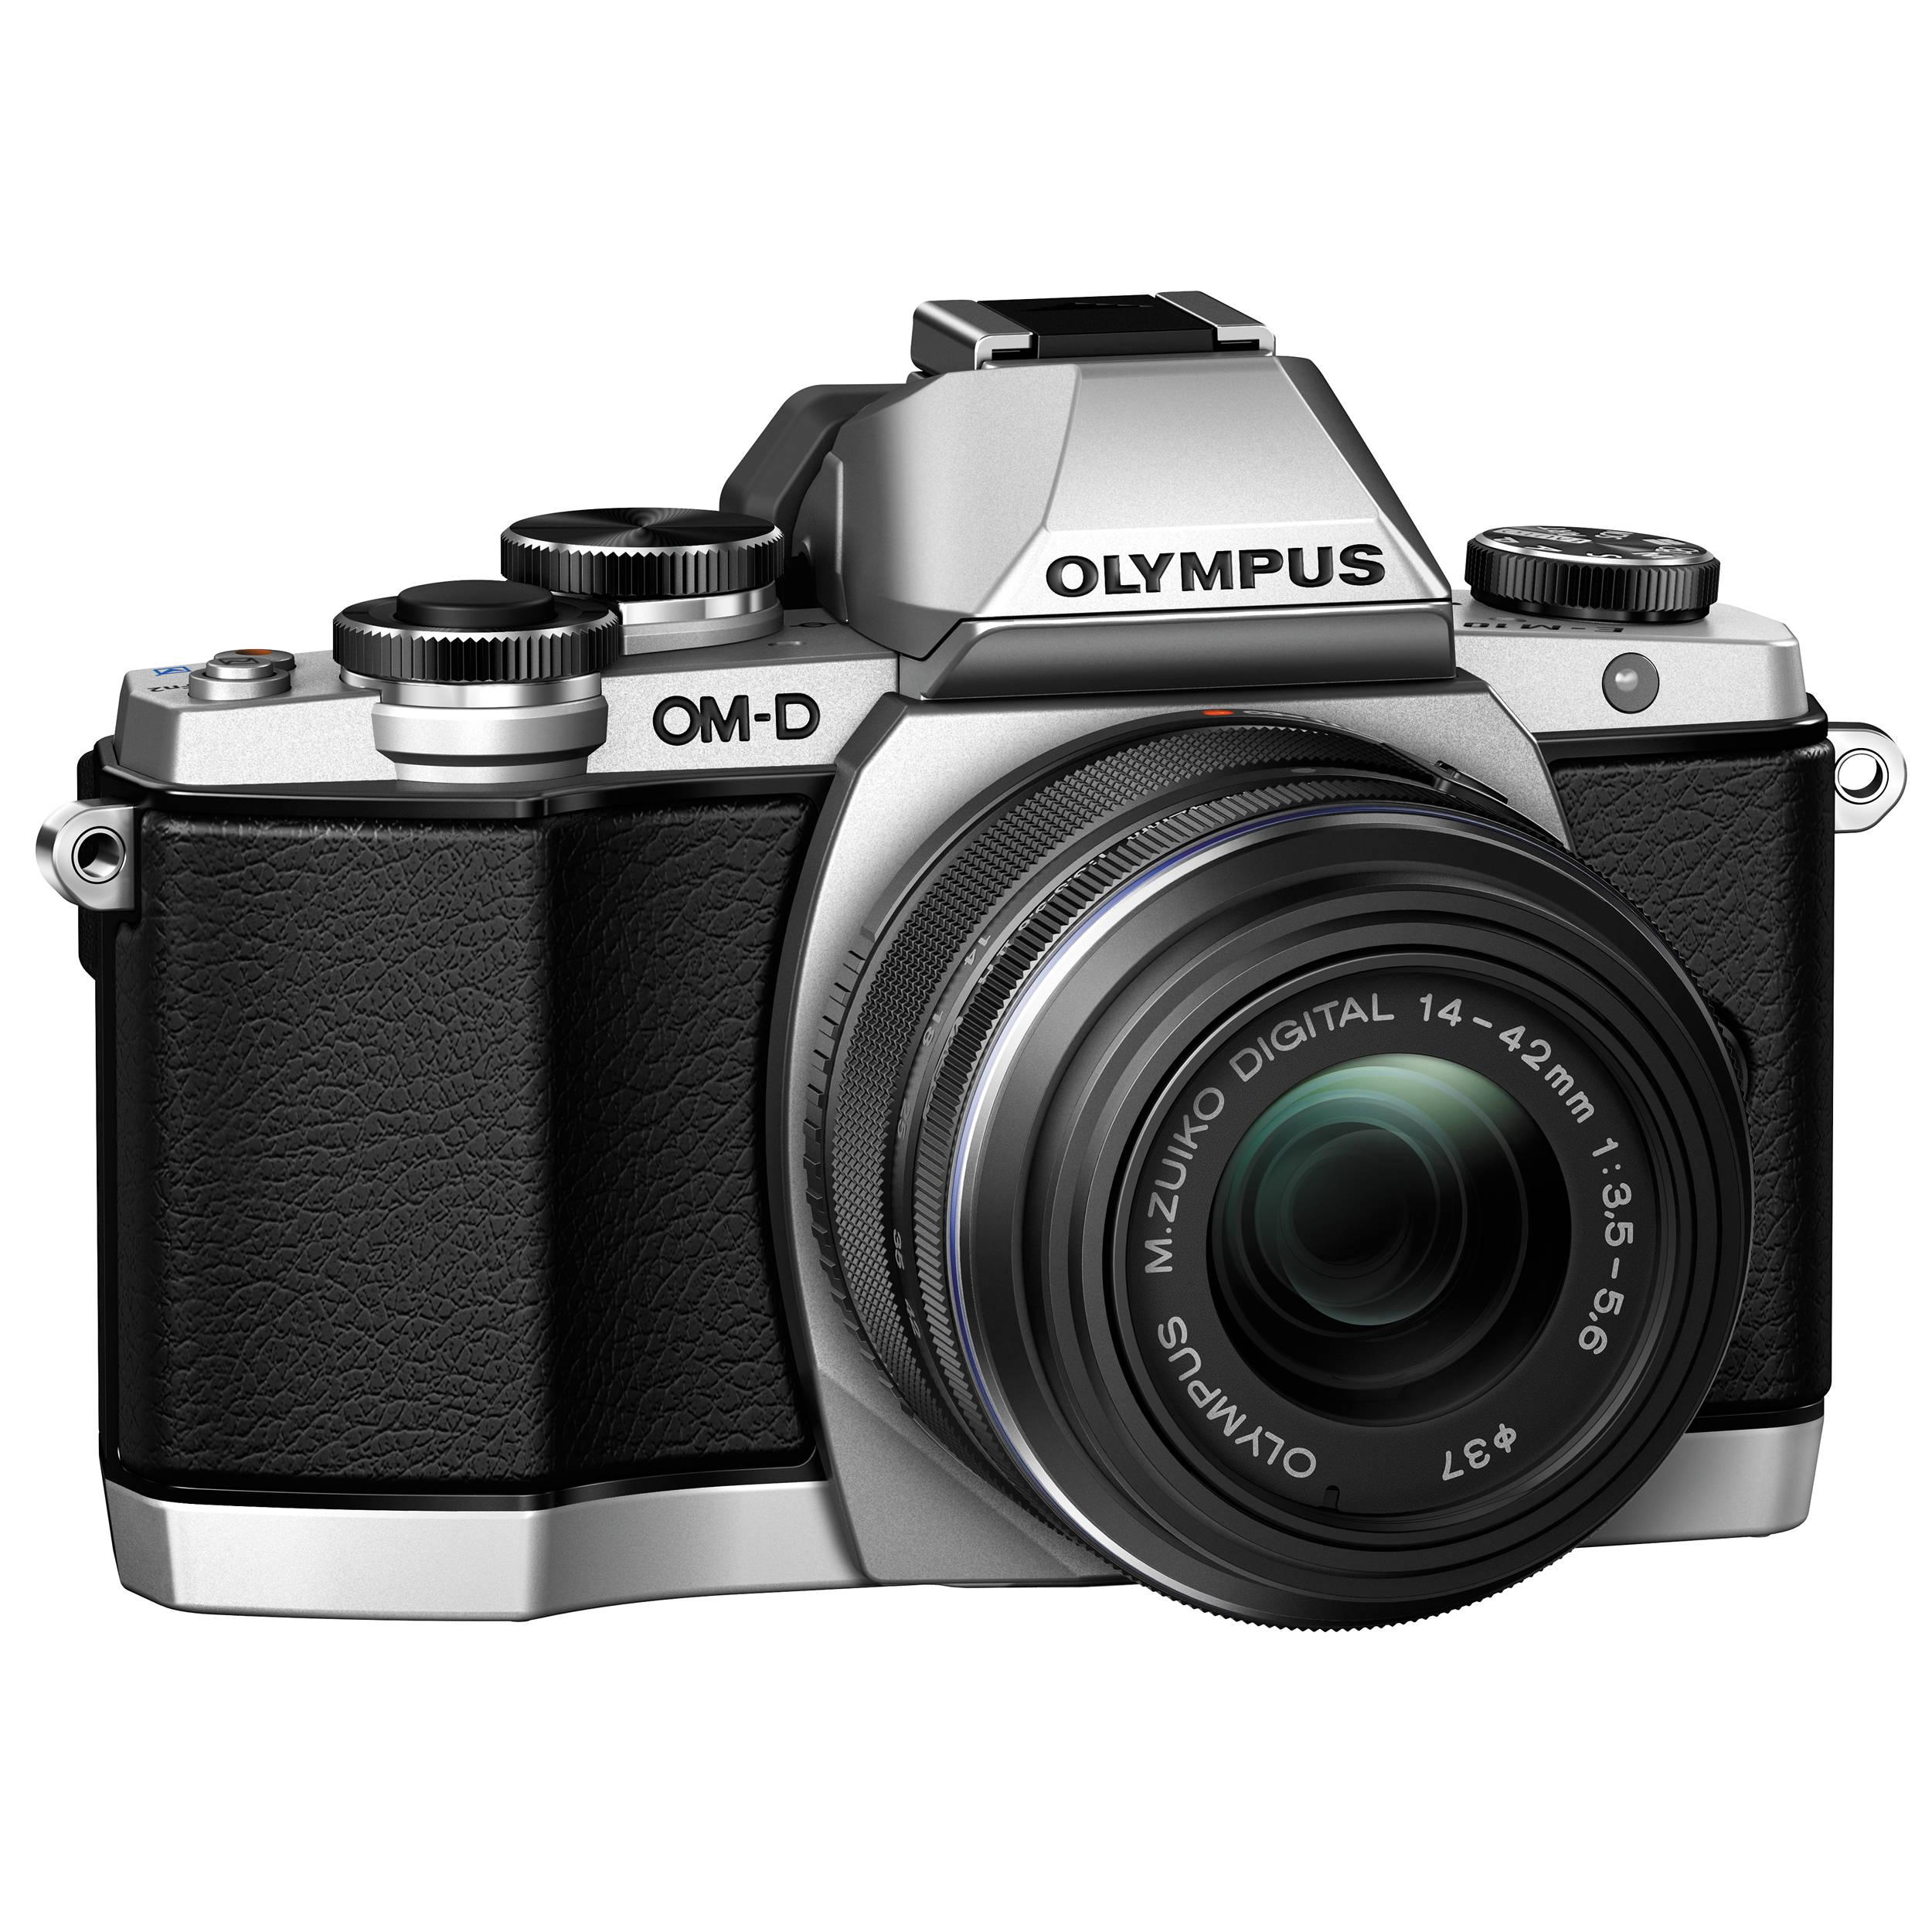 Olympus Digital Camera: Olympus OM-D E-M10 Mirrorless Micro Four Thirds